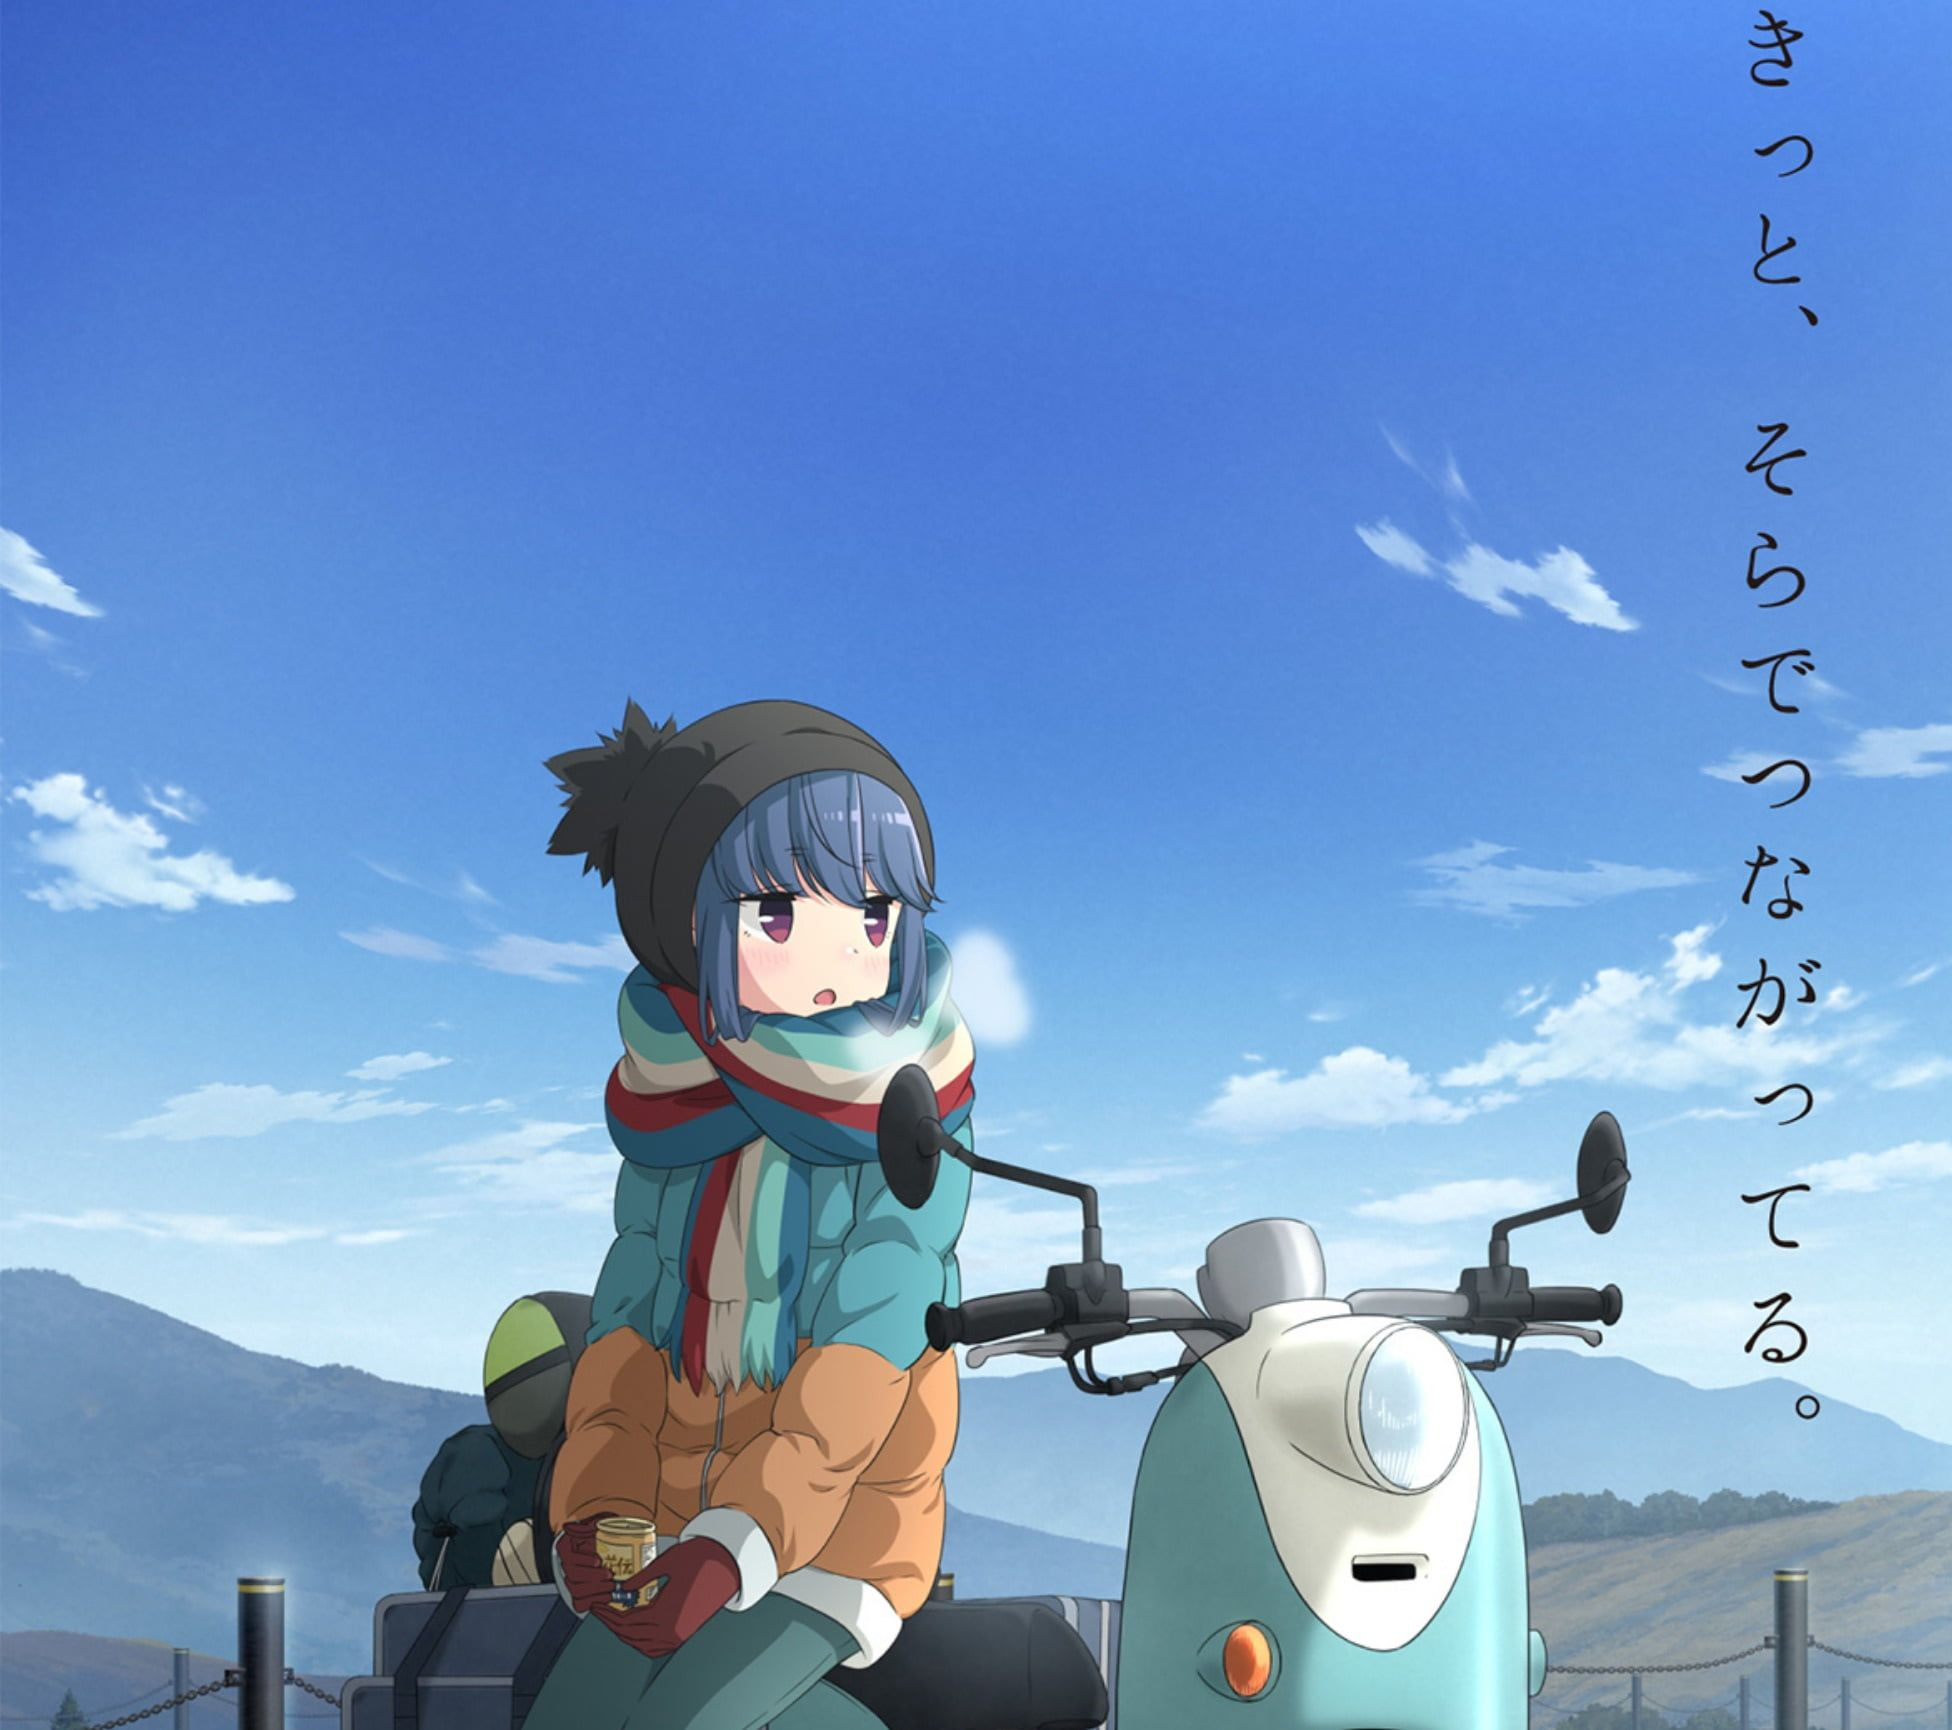 Anime Yuru Camp Rin Shima 1080p Wallpaper Hdwallpaper Desktop In 2021 Anime Anime Scenery Wallpaper Character Wallpaper